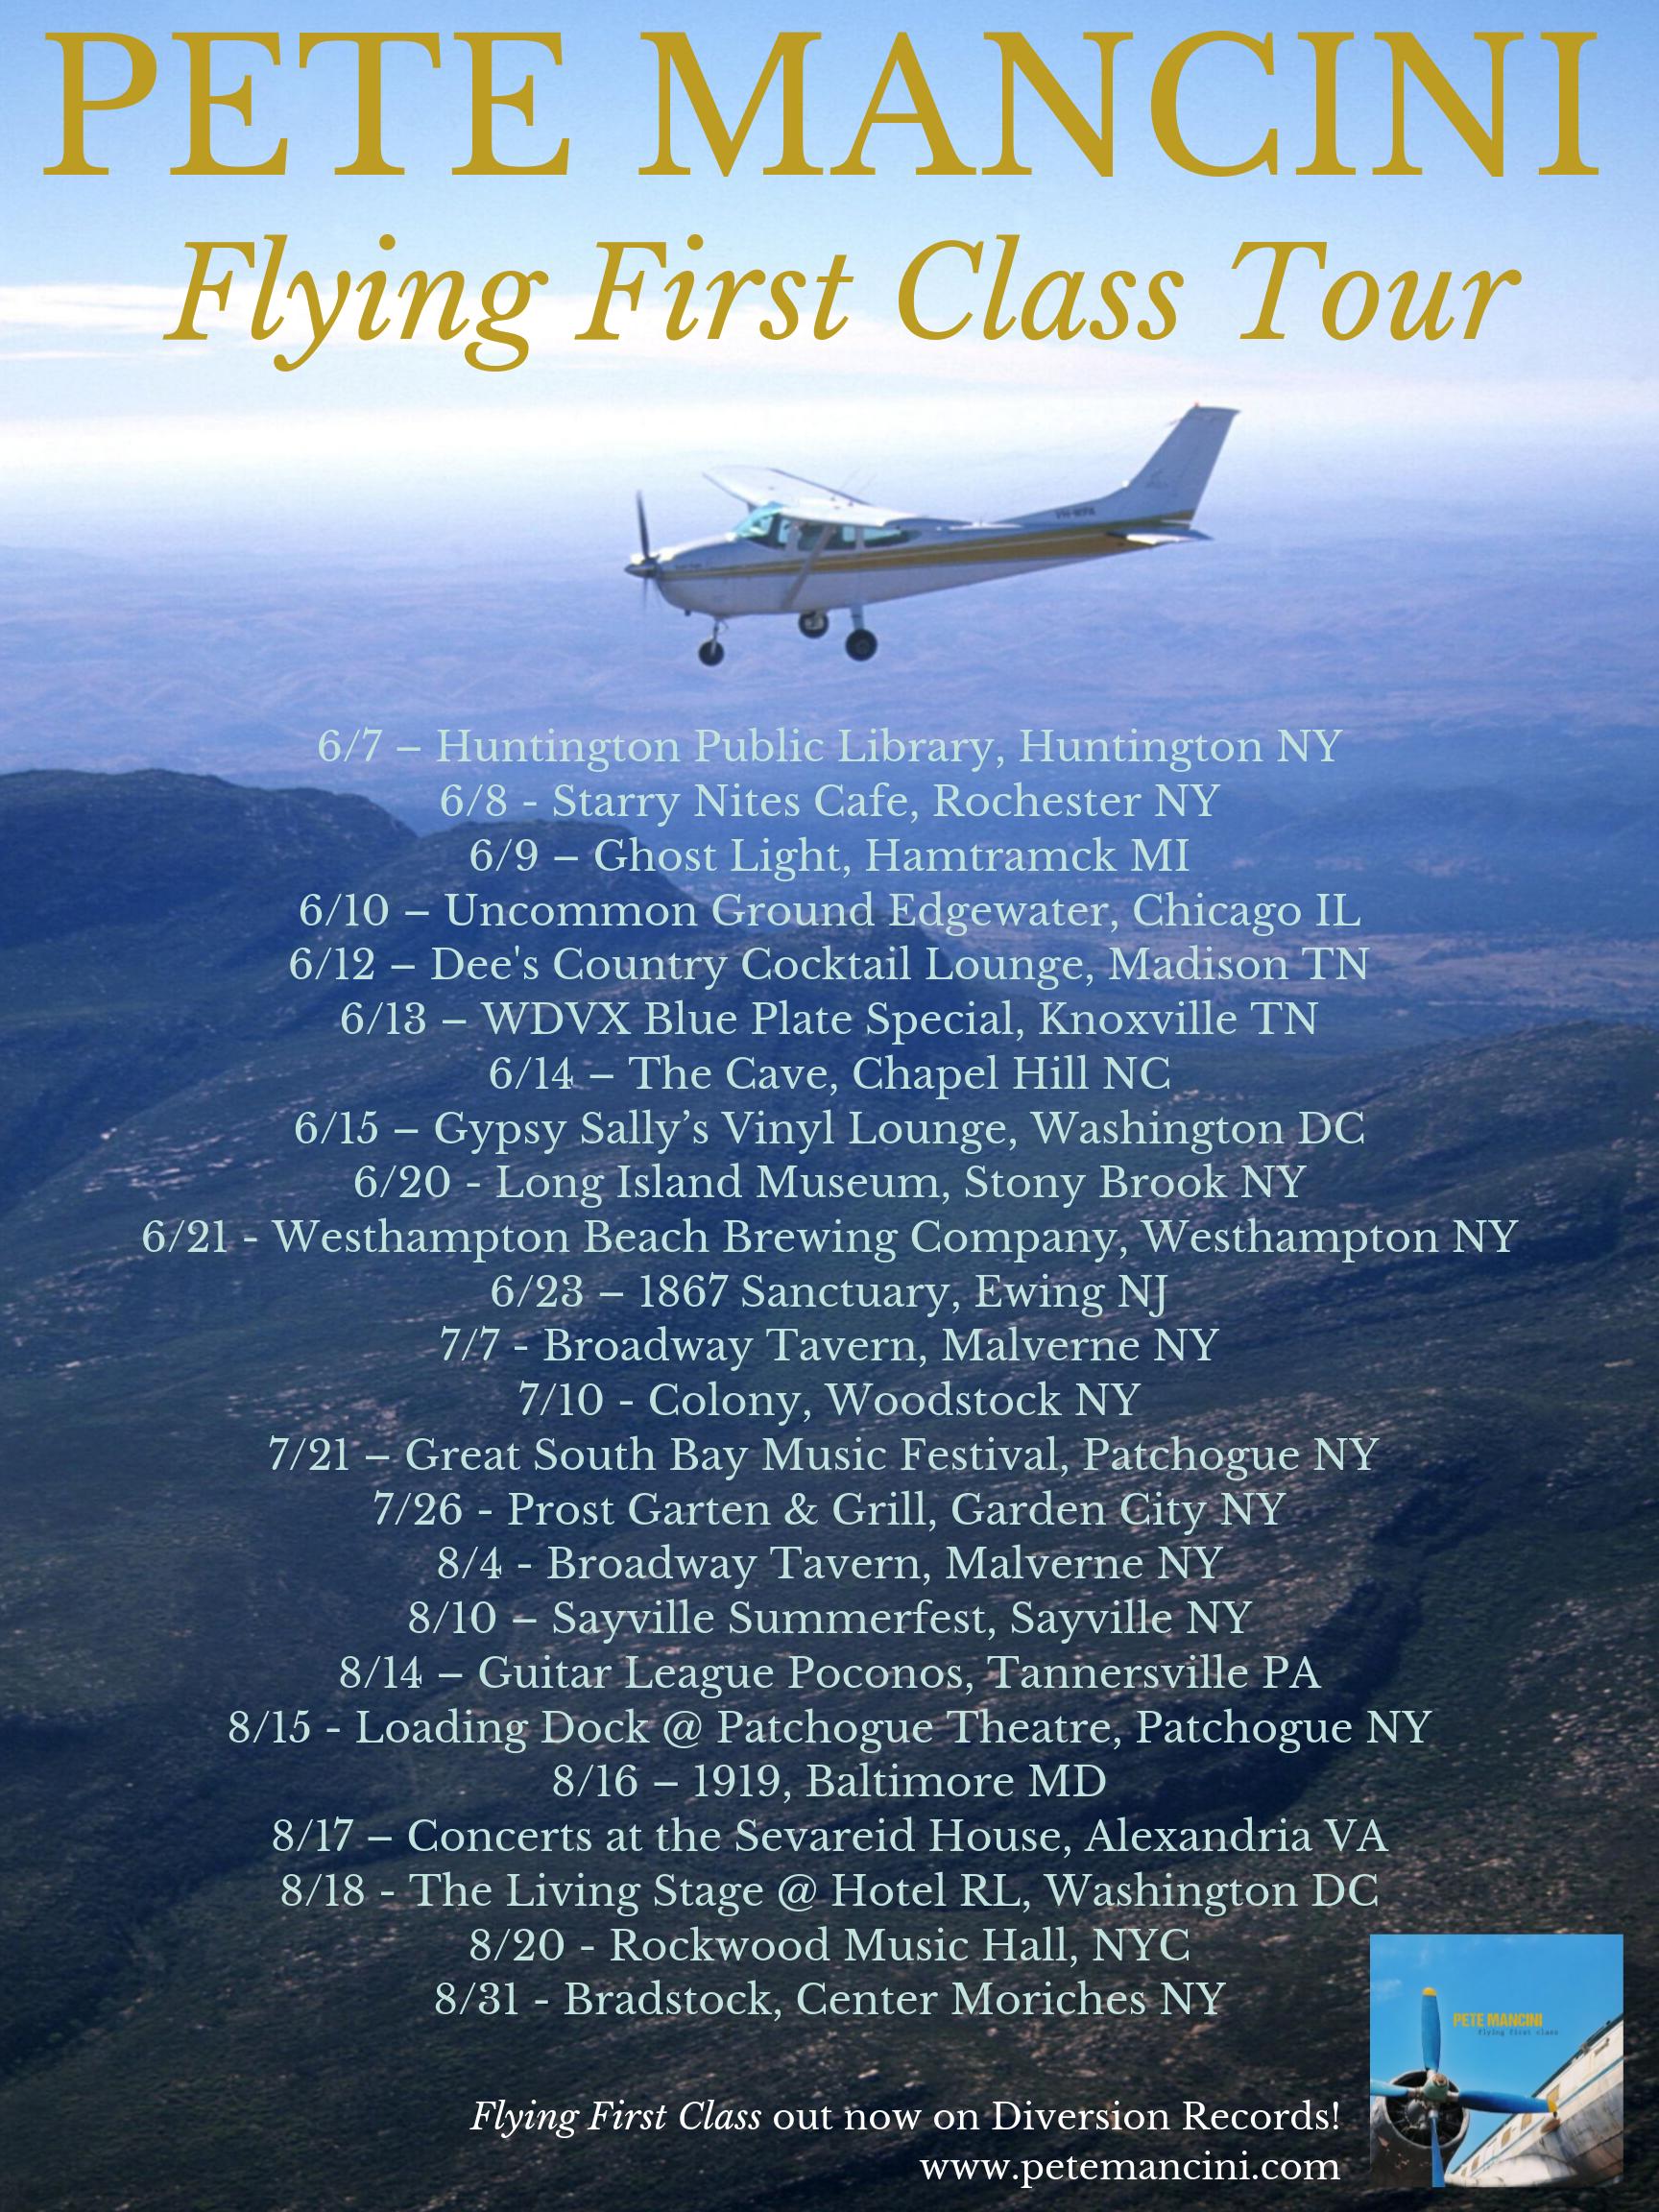 FFC tour poster